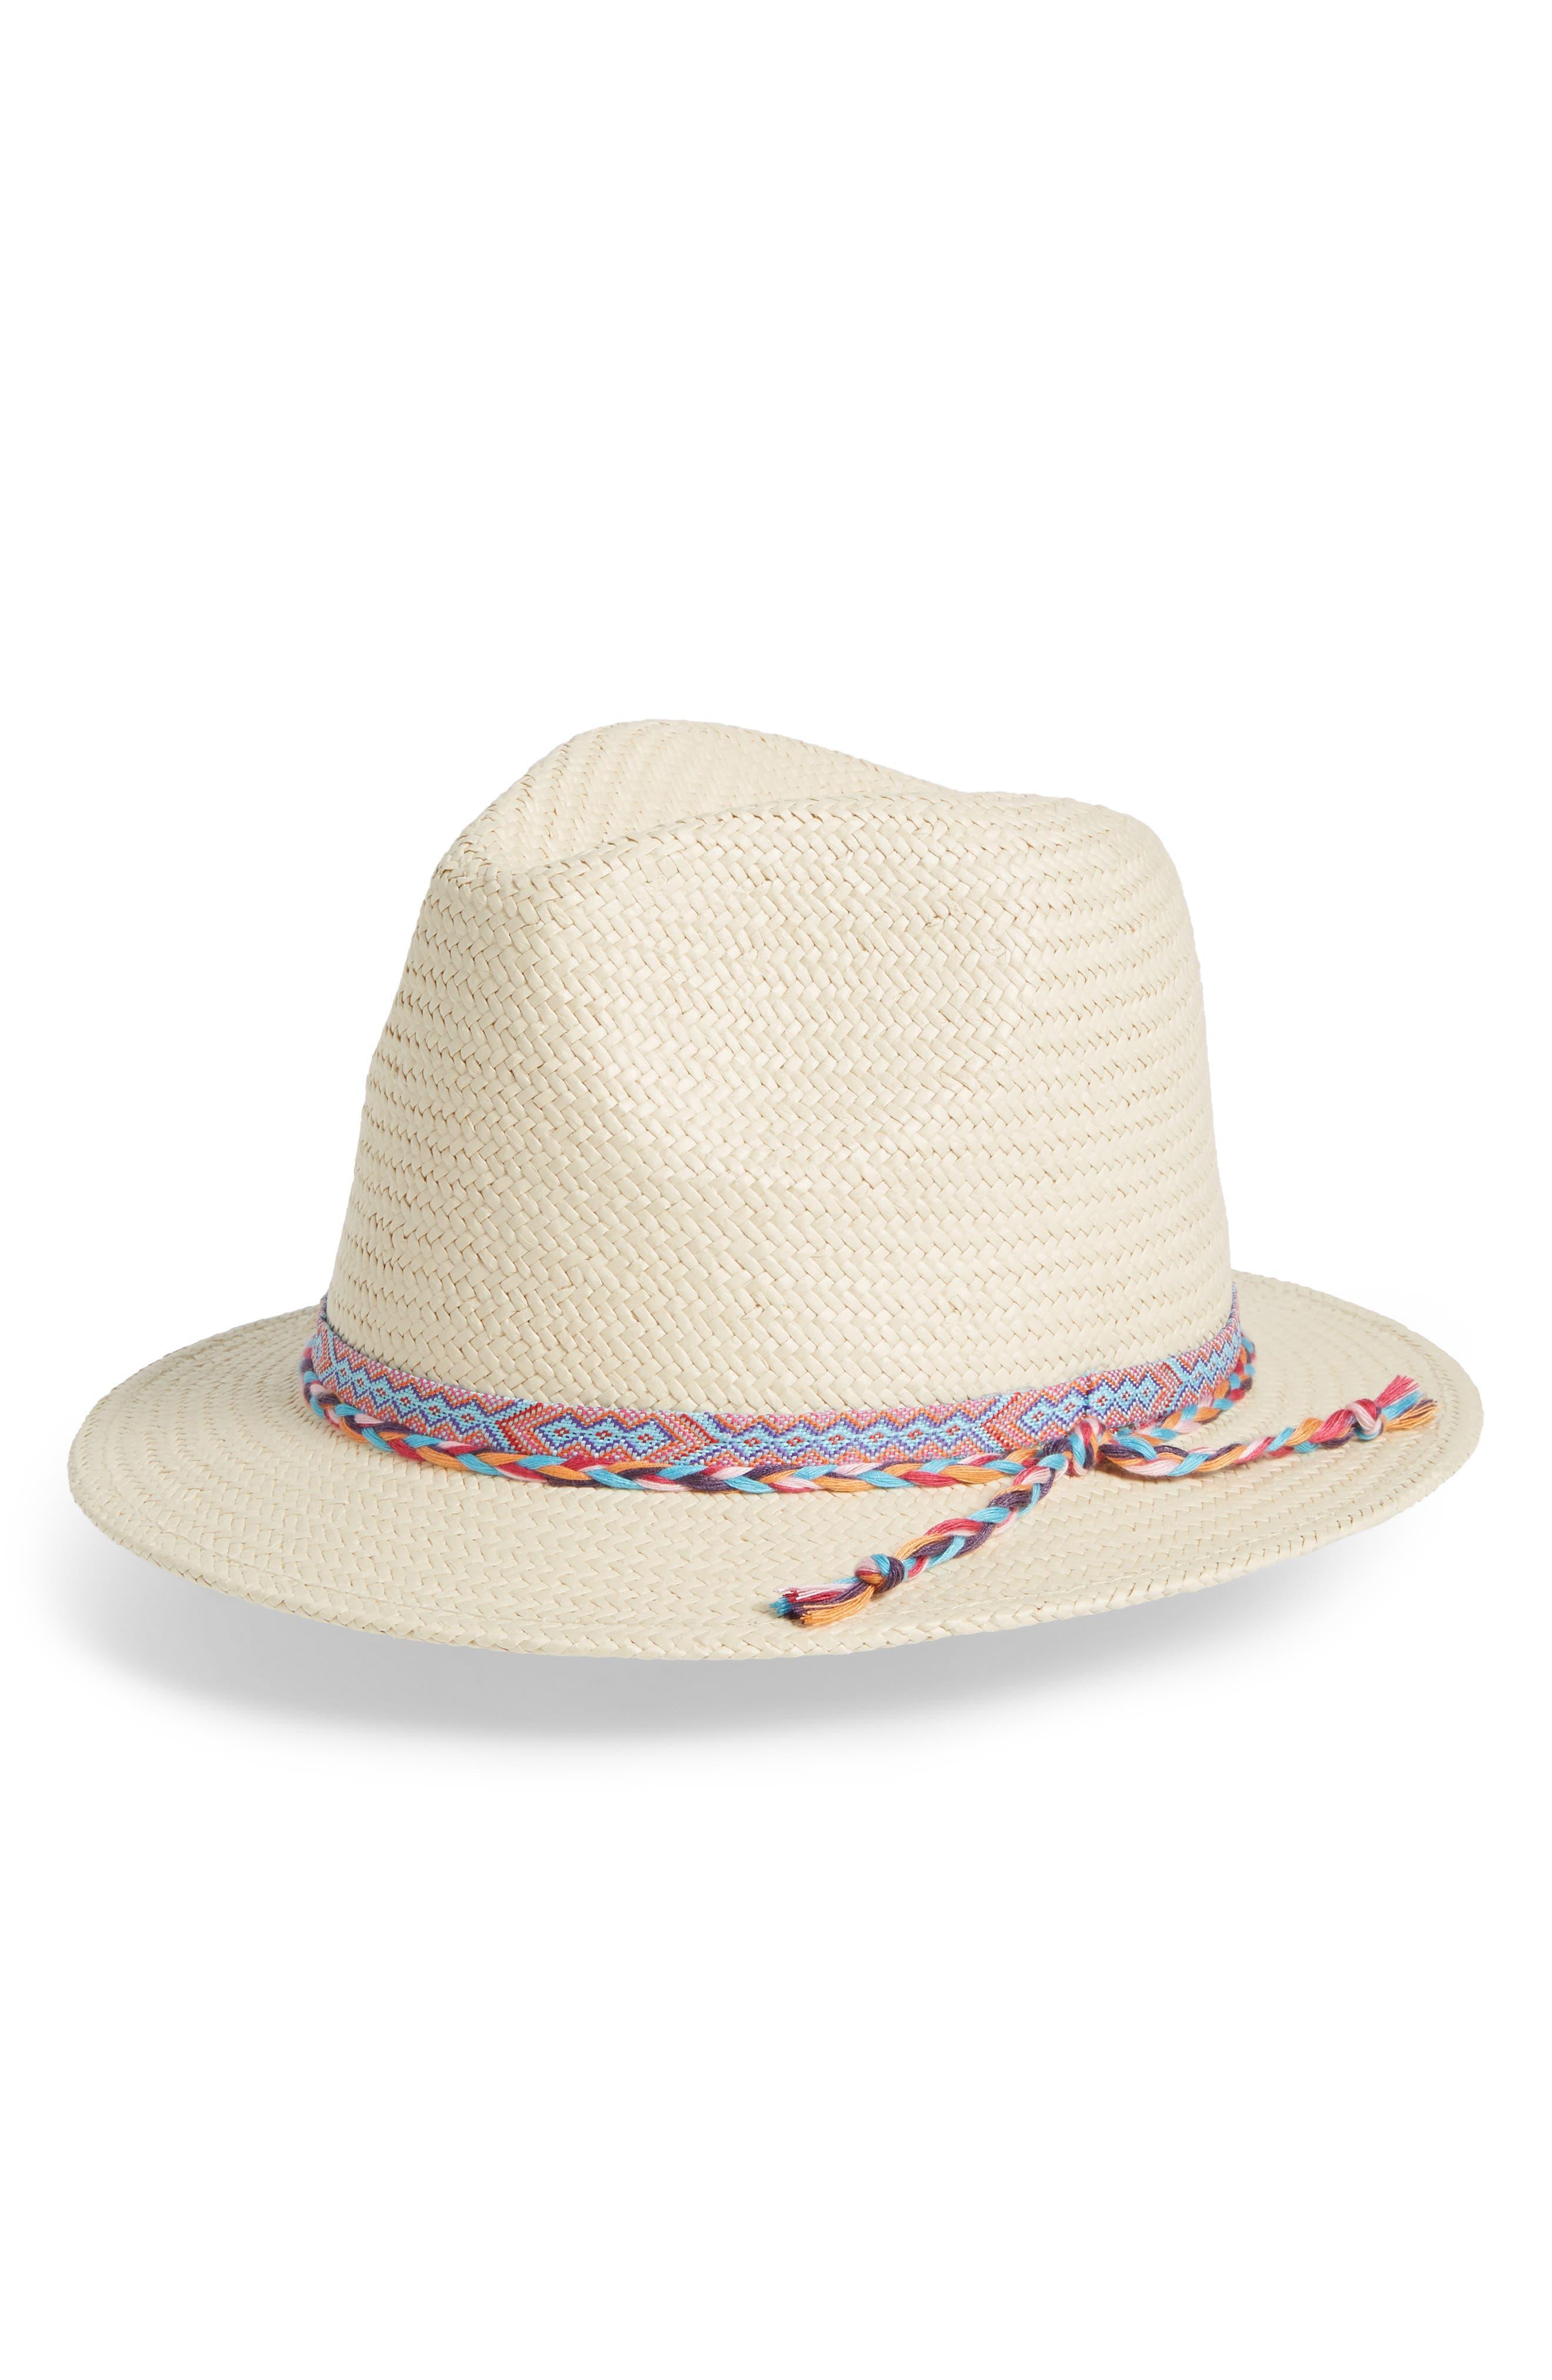 Braided Trim Panama Hat,                         Main,                         color, 235